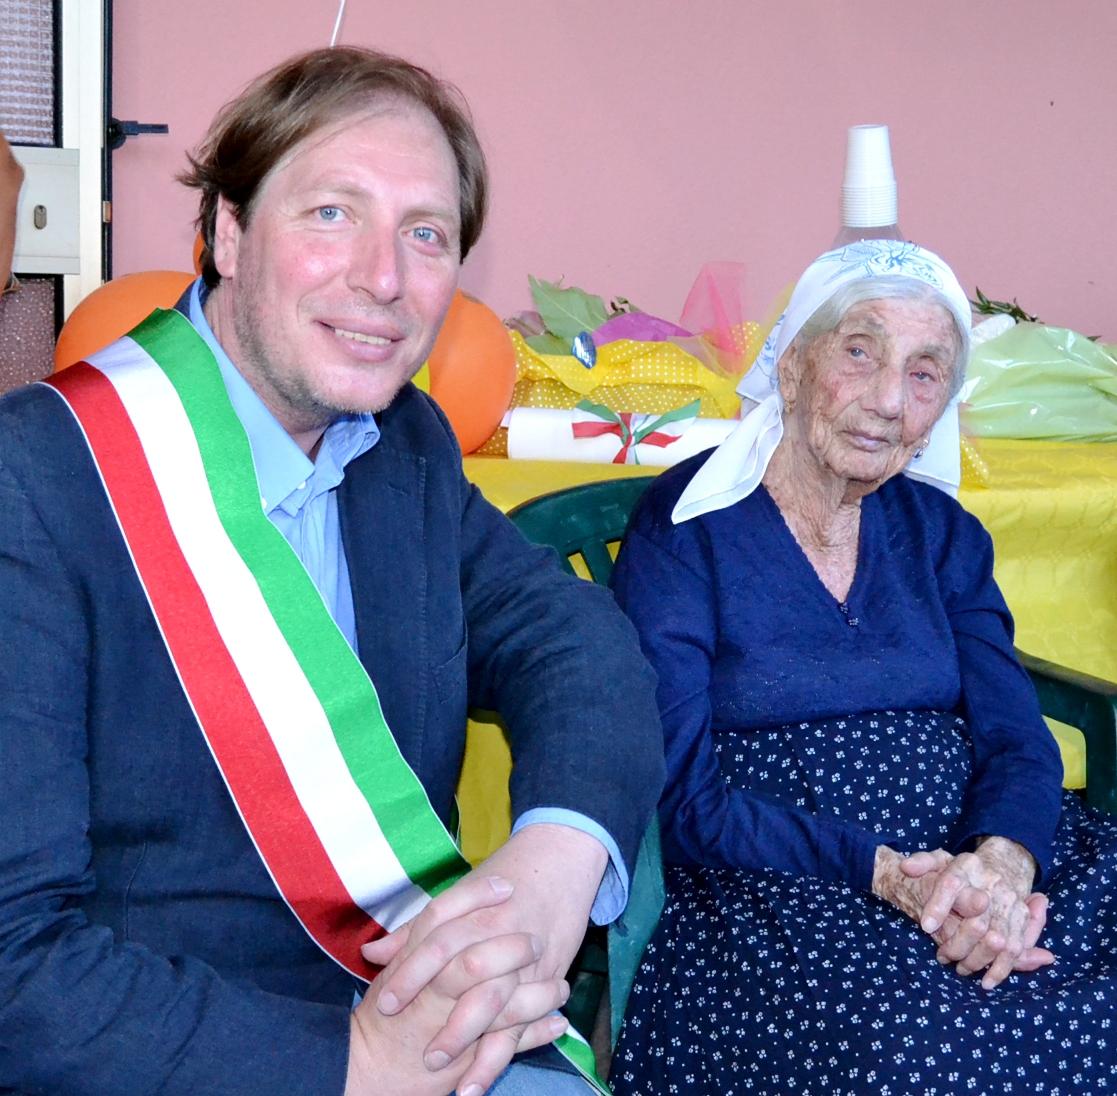 Il sindaco Coppola con nonna Franceschina